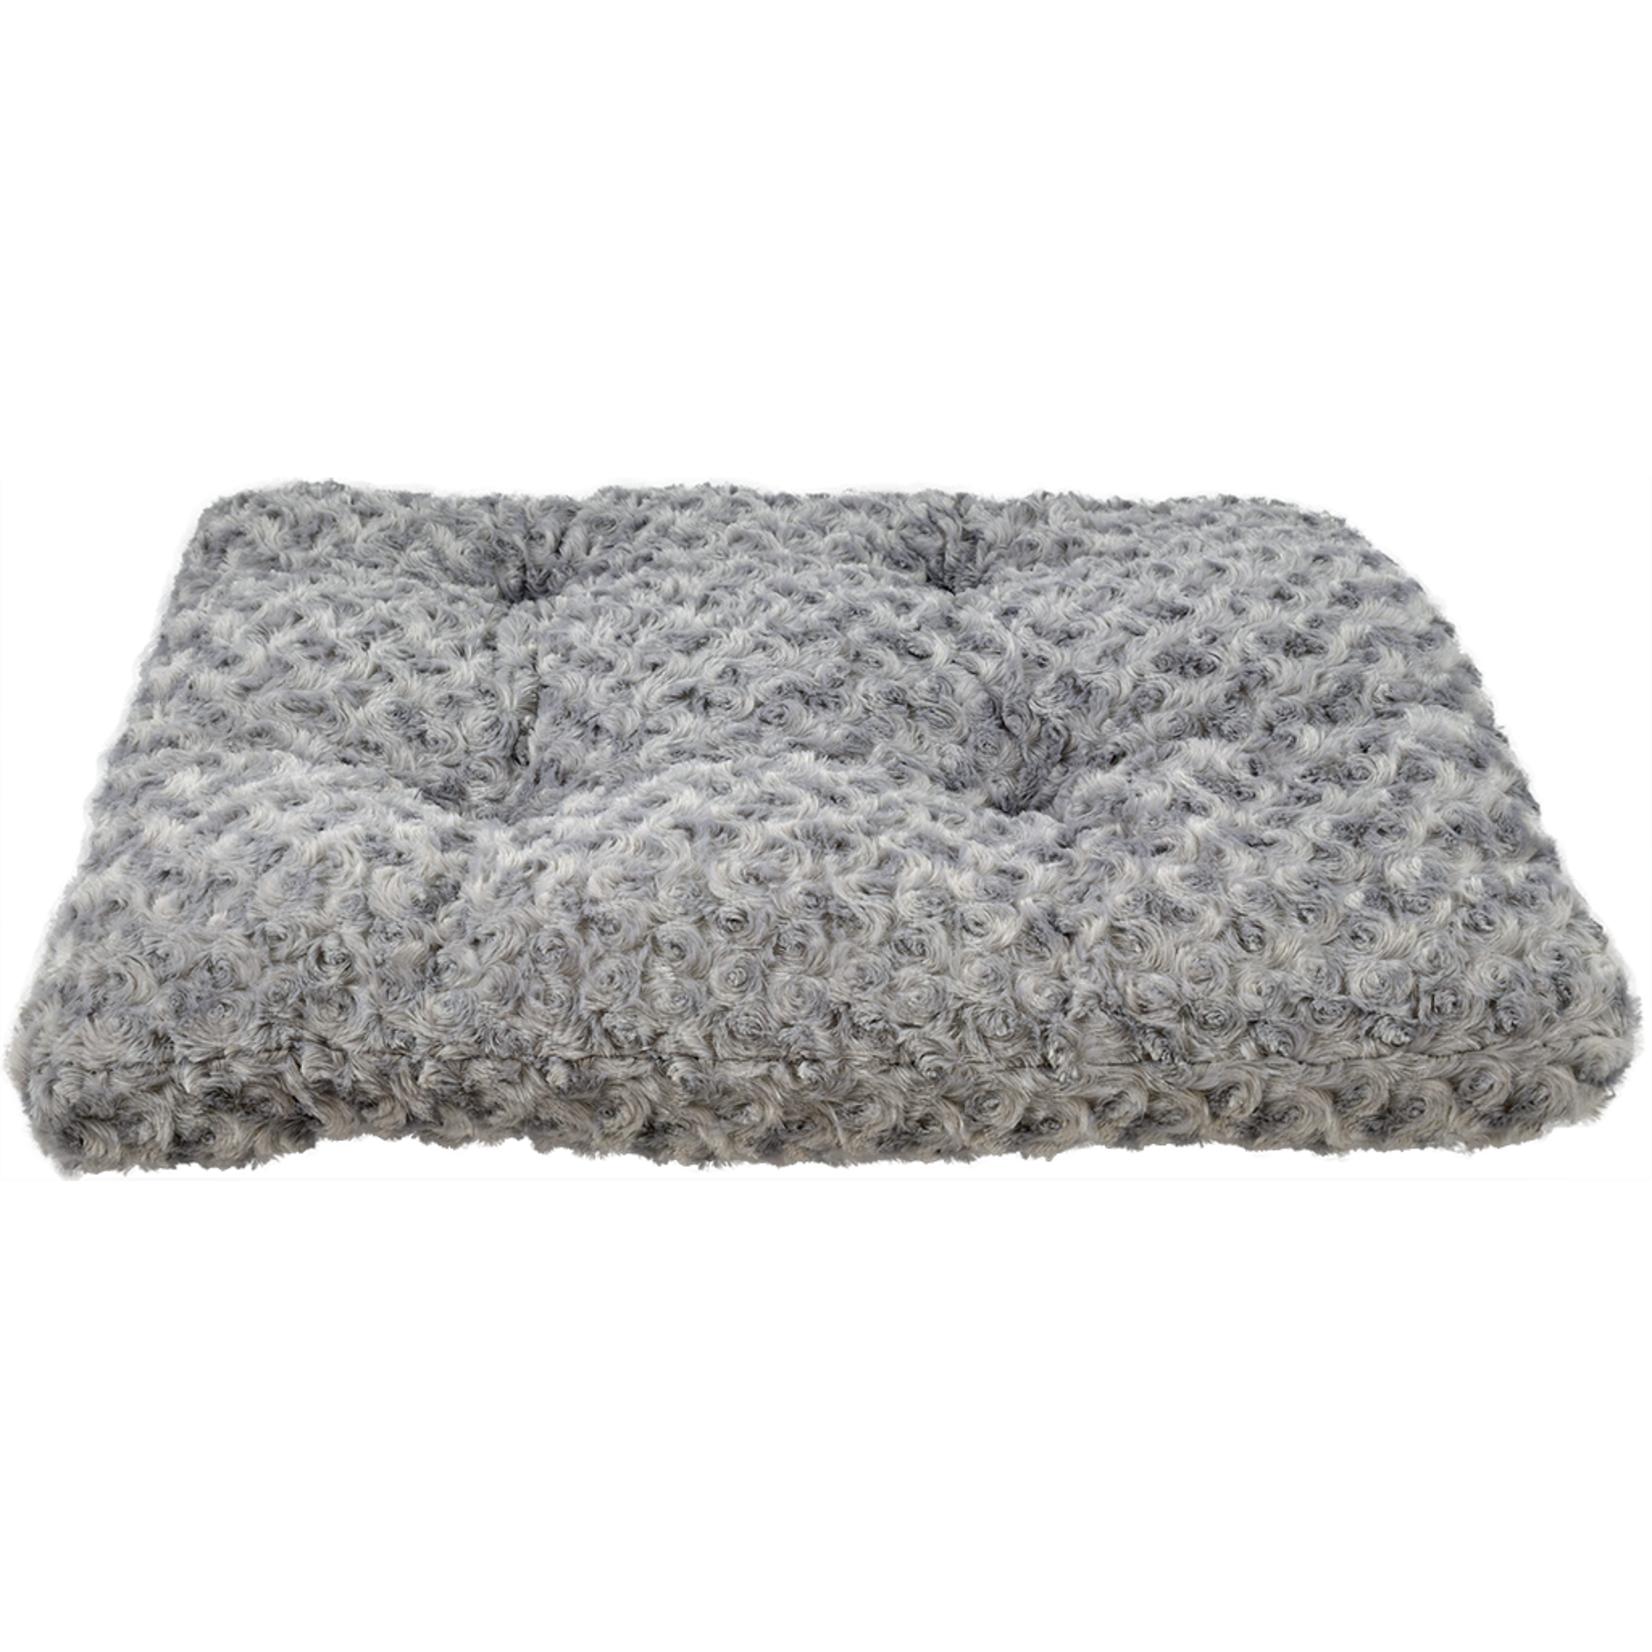 "Unleashed bed (dog mat)  48x30"" 2XL"